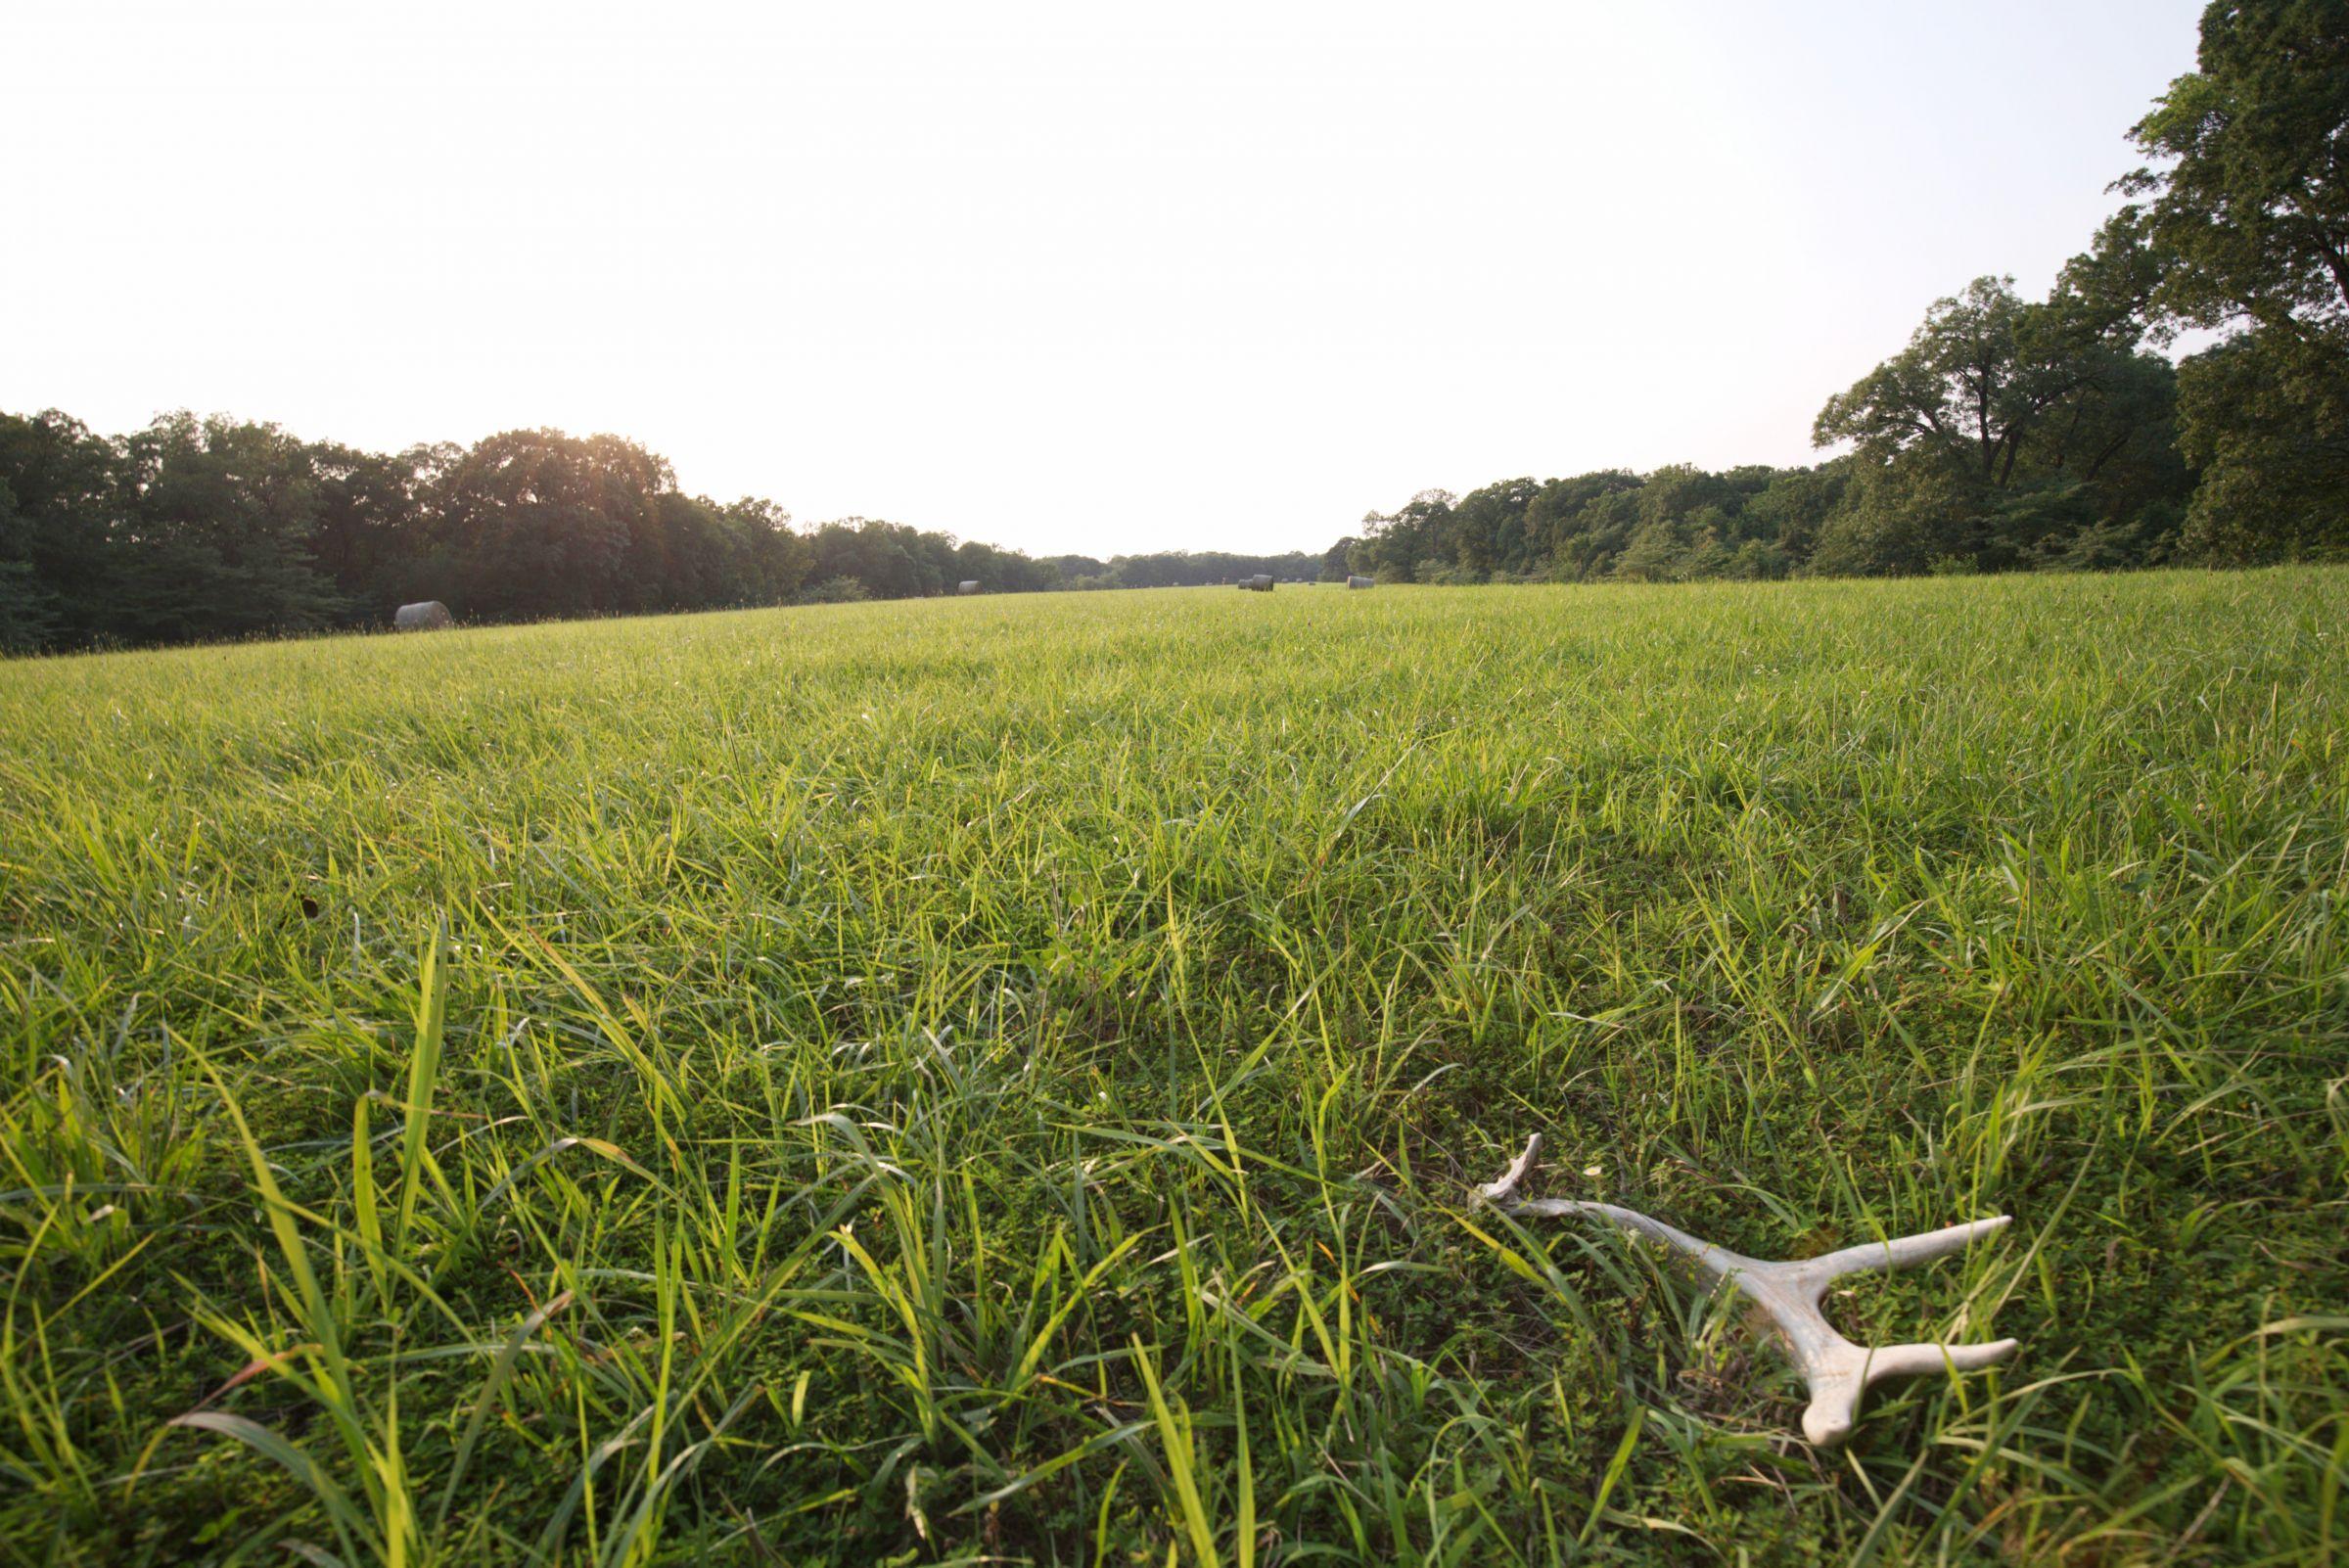 land-lee-county-iowa-340-acres-listing-number-15649-6-2021-07-21-184945.jpg